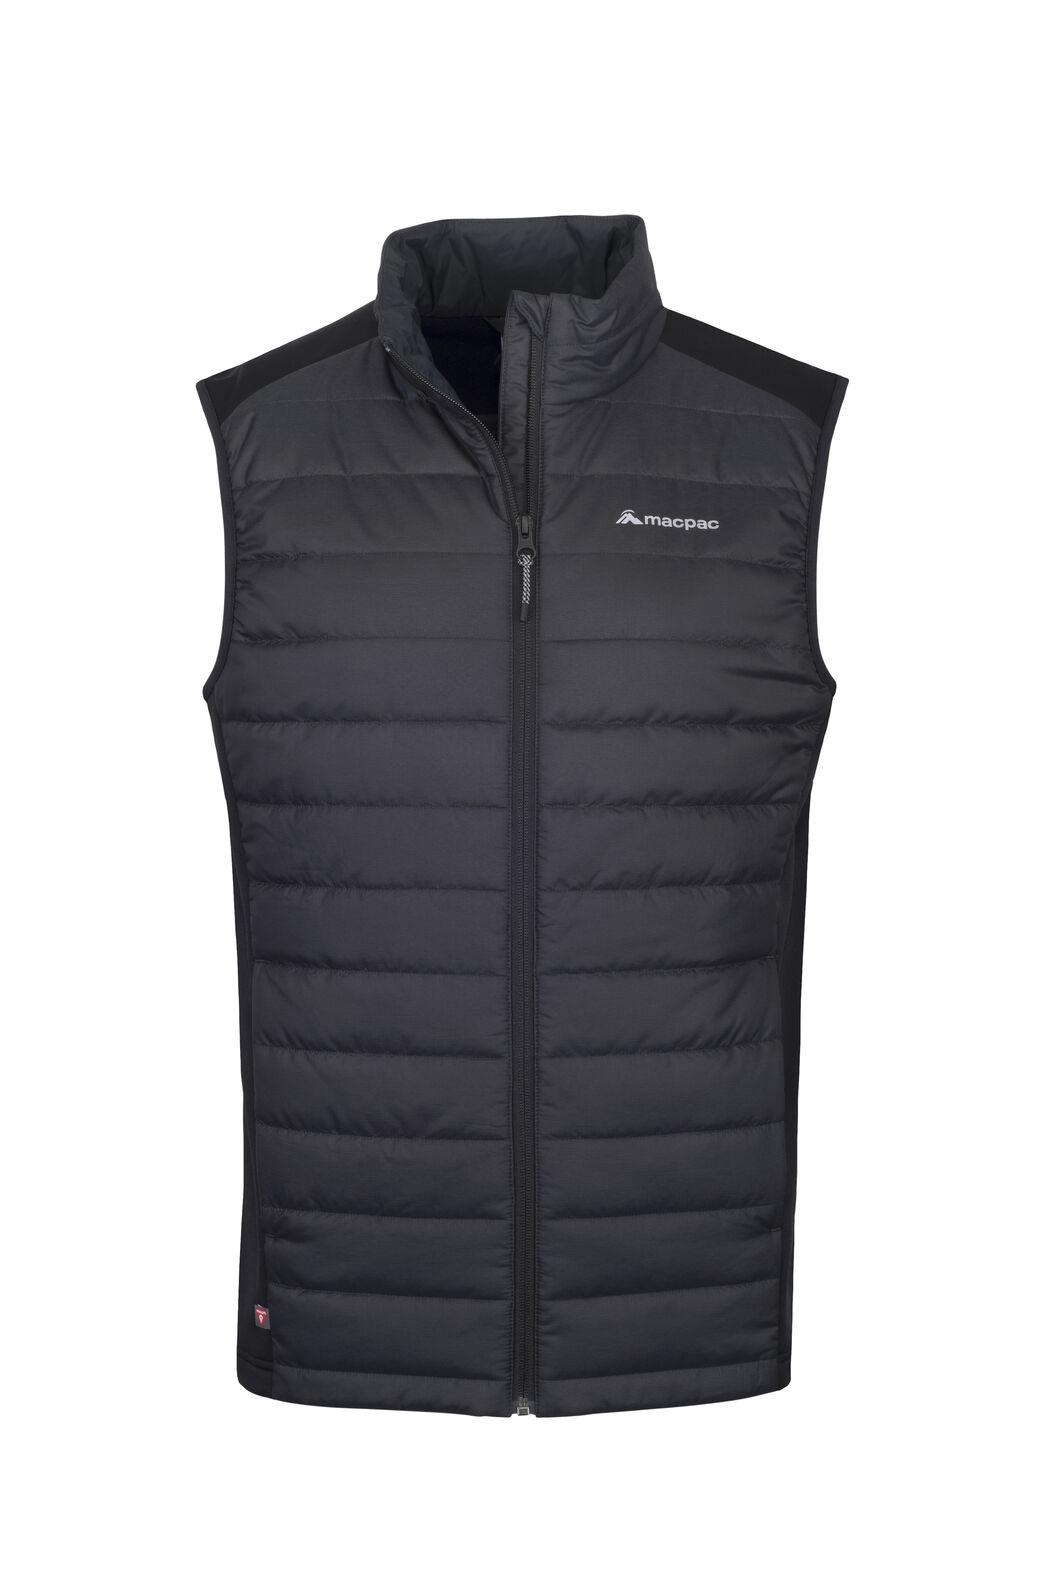 Macpac Strider Hybrid PrimaLoft® Vest — Men's, Black, hi-res